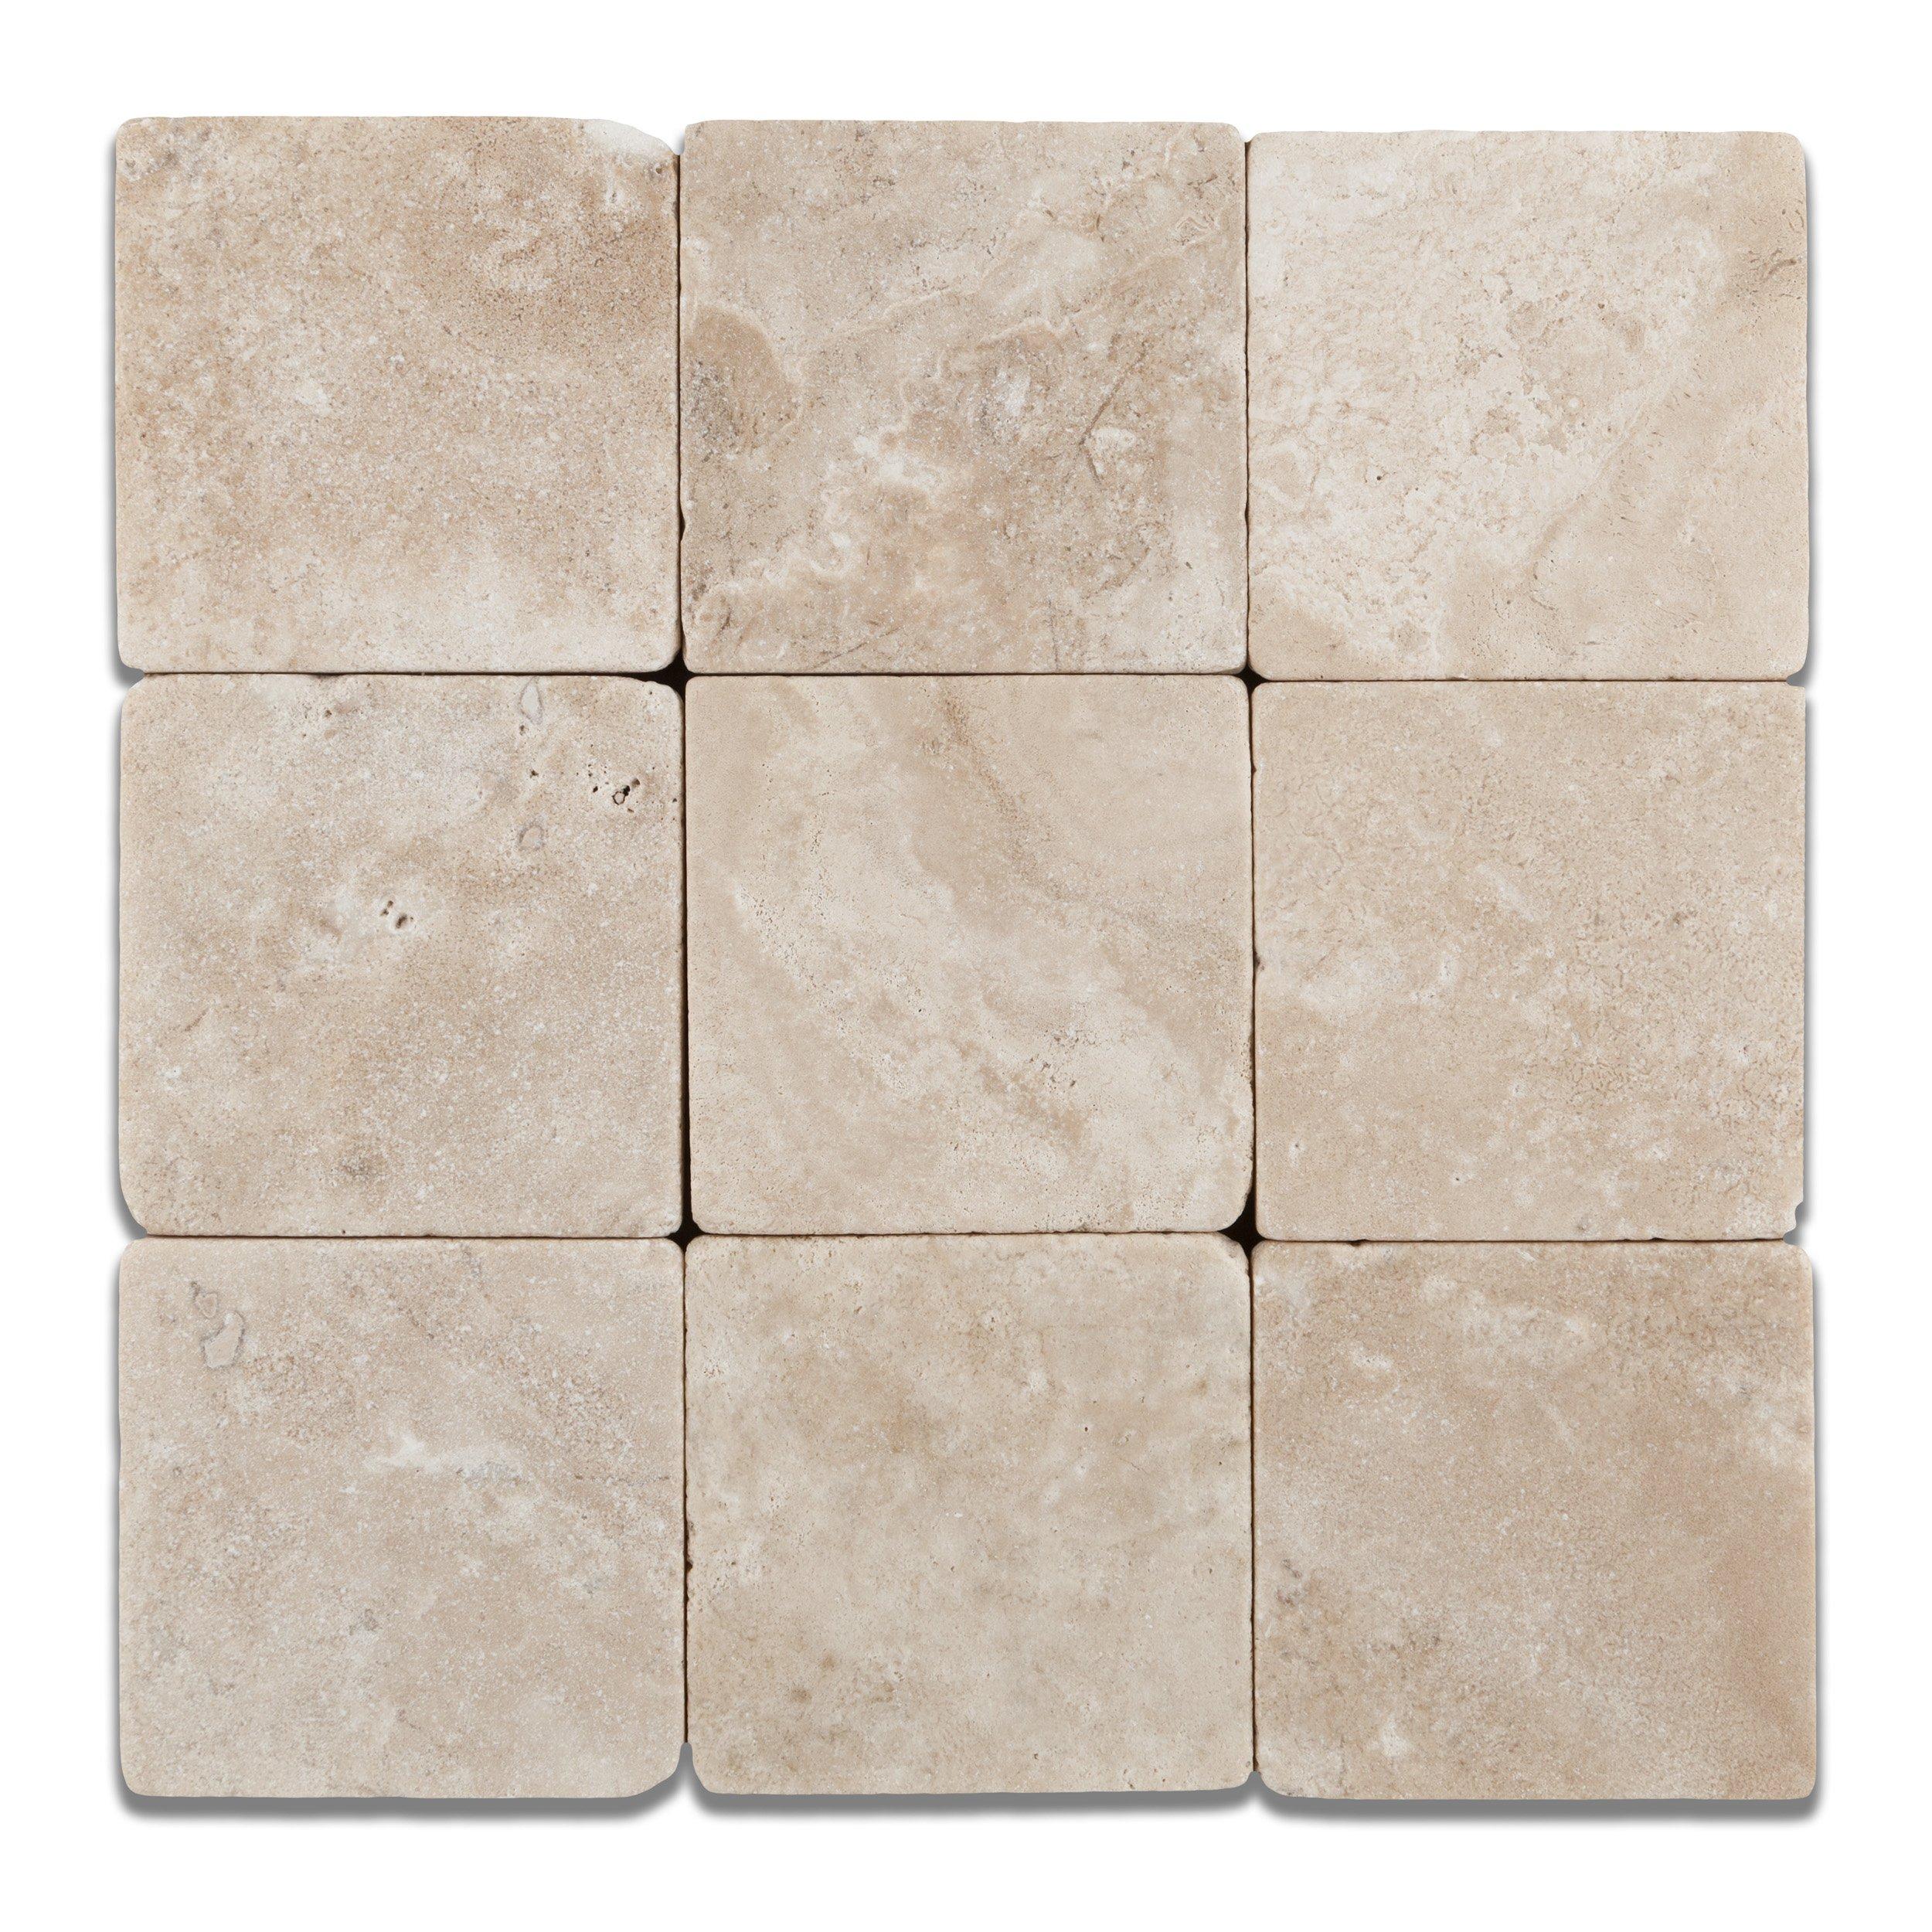 Durango Cream (Paredon) Travertine 4 X 4 Field Tile, Tumbled - 4-pcs. Sample Set